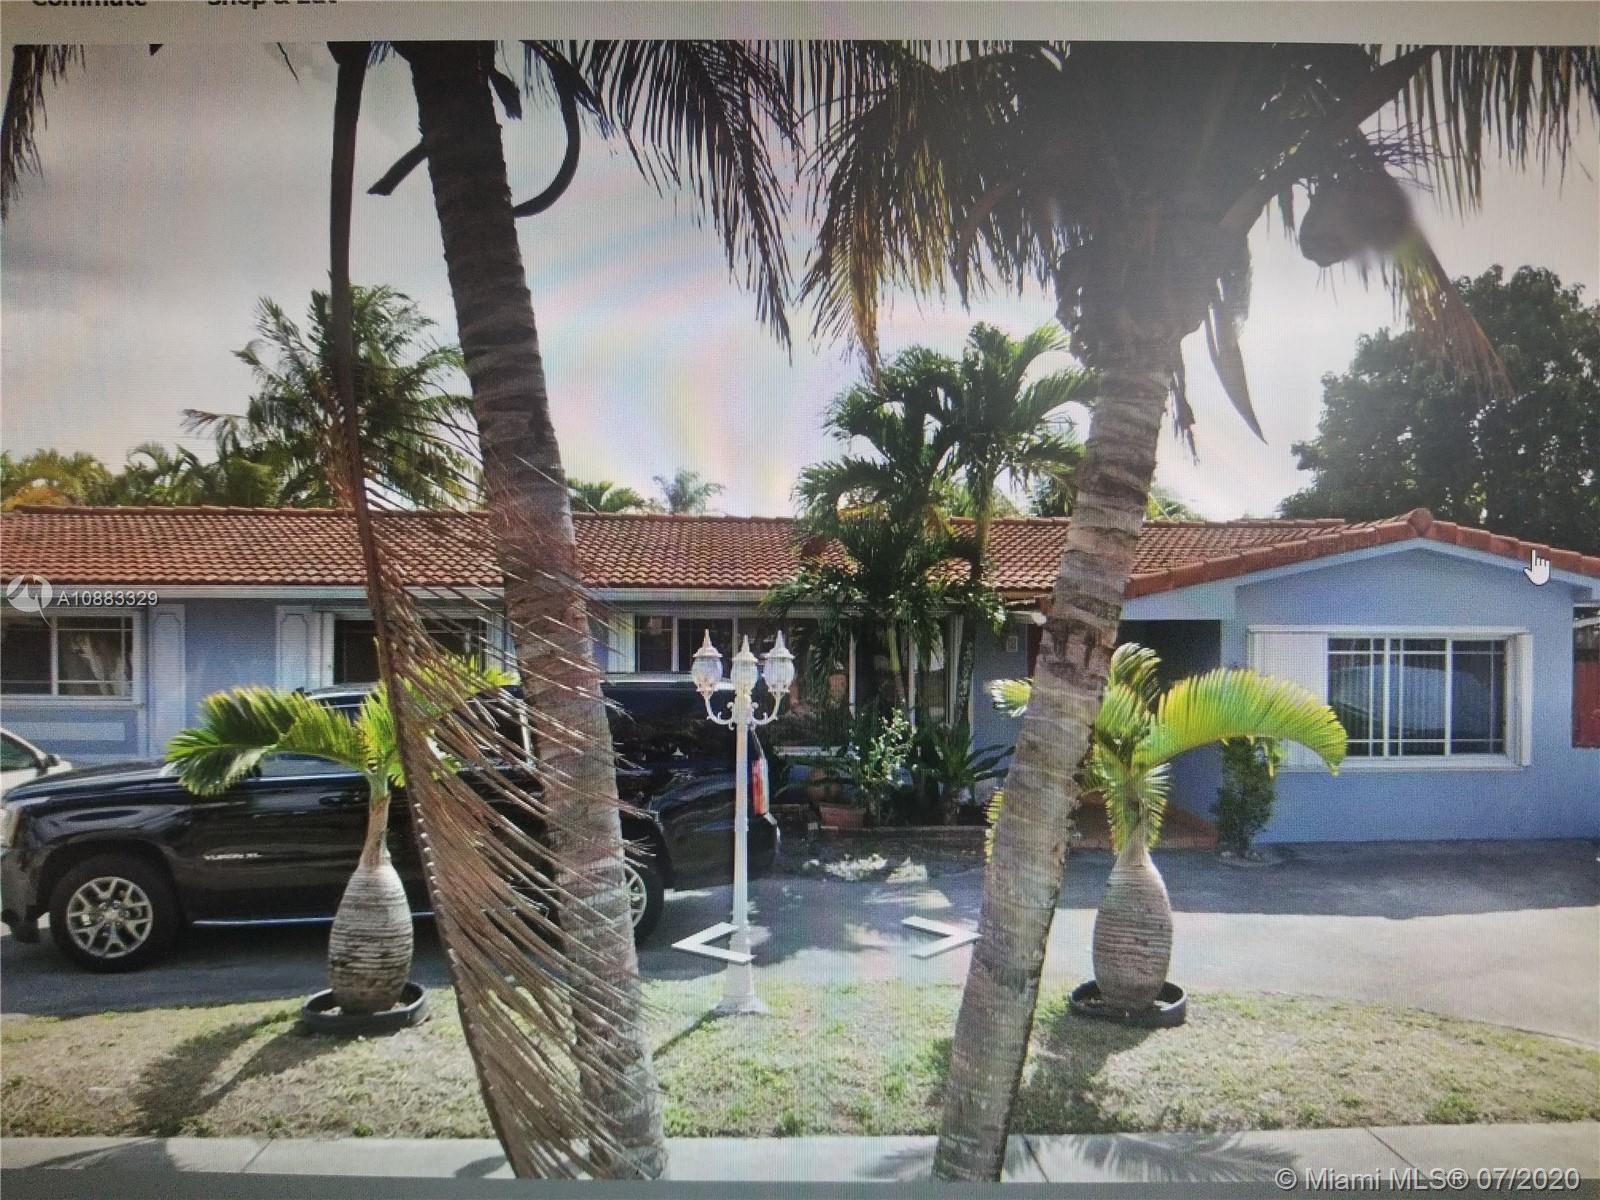 1786 W 80th St, Hialeah, FL 33014 - #: A10883329